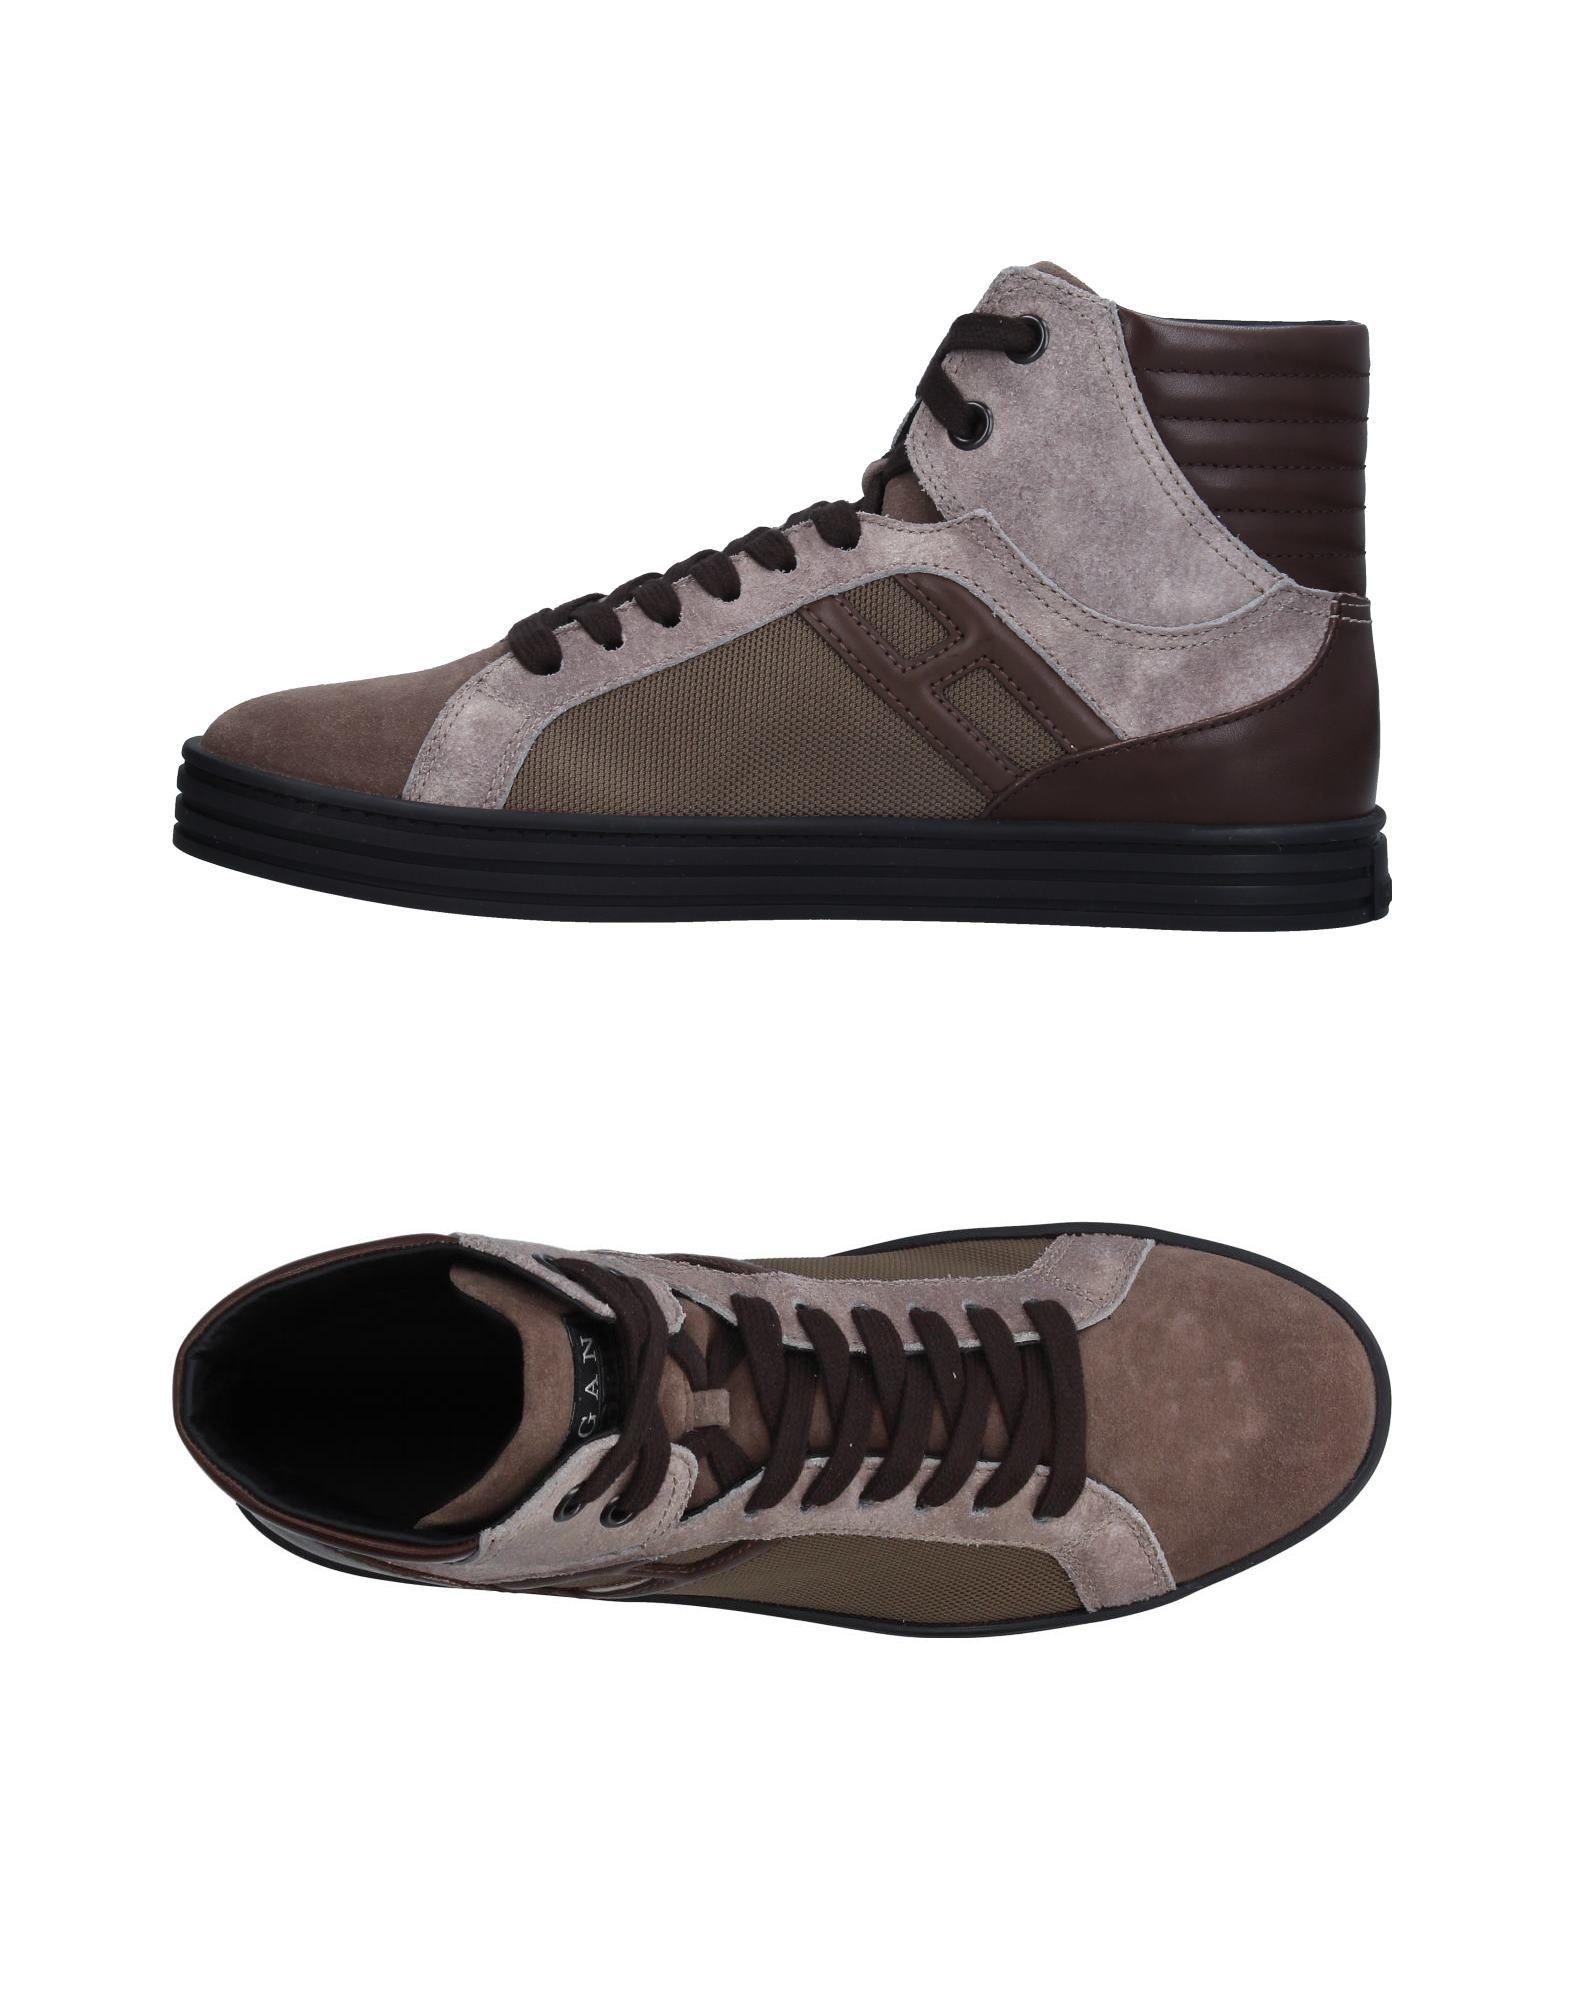 Hogan Rebel Sneakers Herren  11288861CJ Gute Qualität beliebte Schuhe